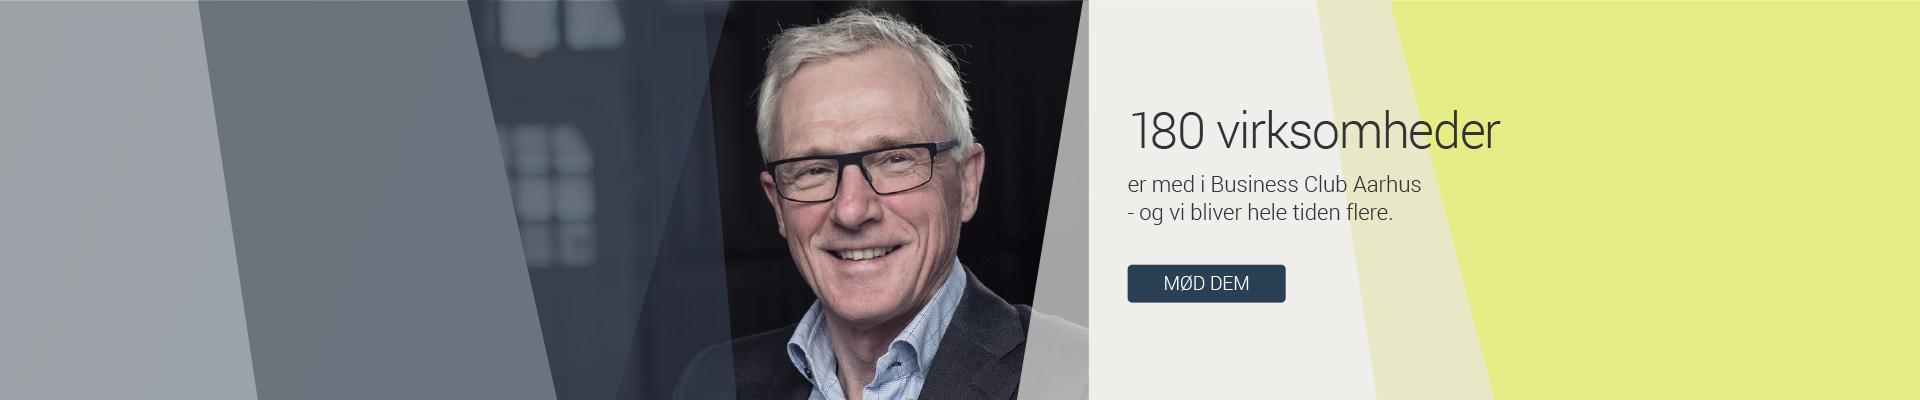 frise_jensbjerg1920